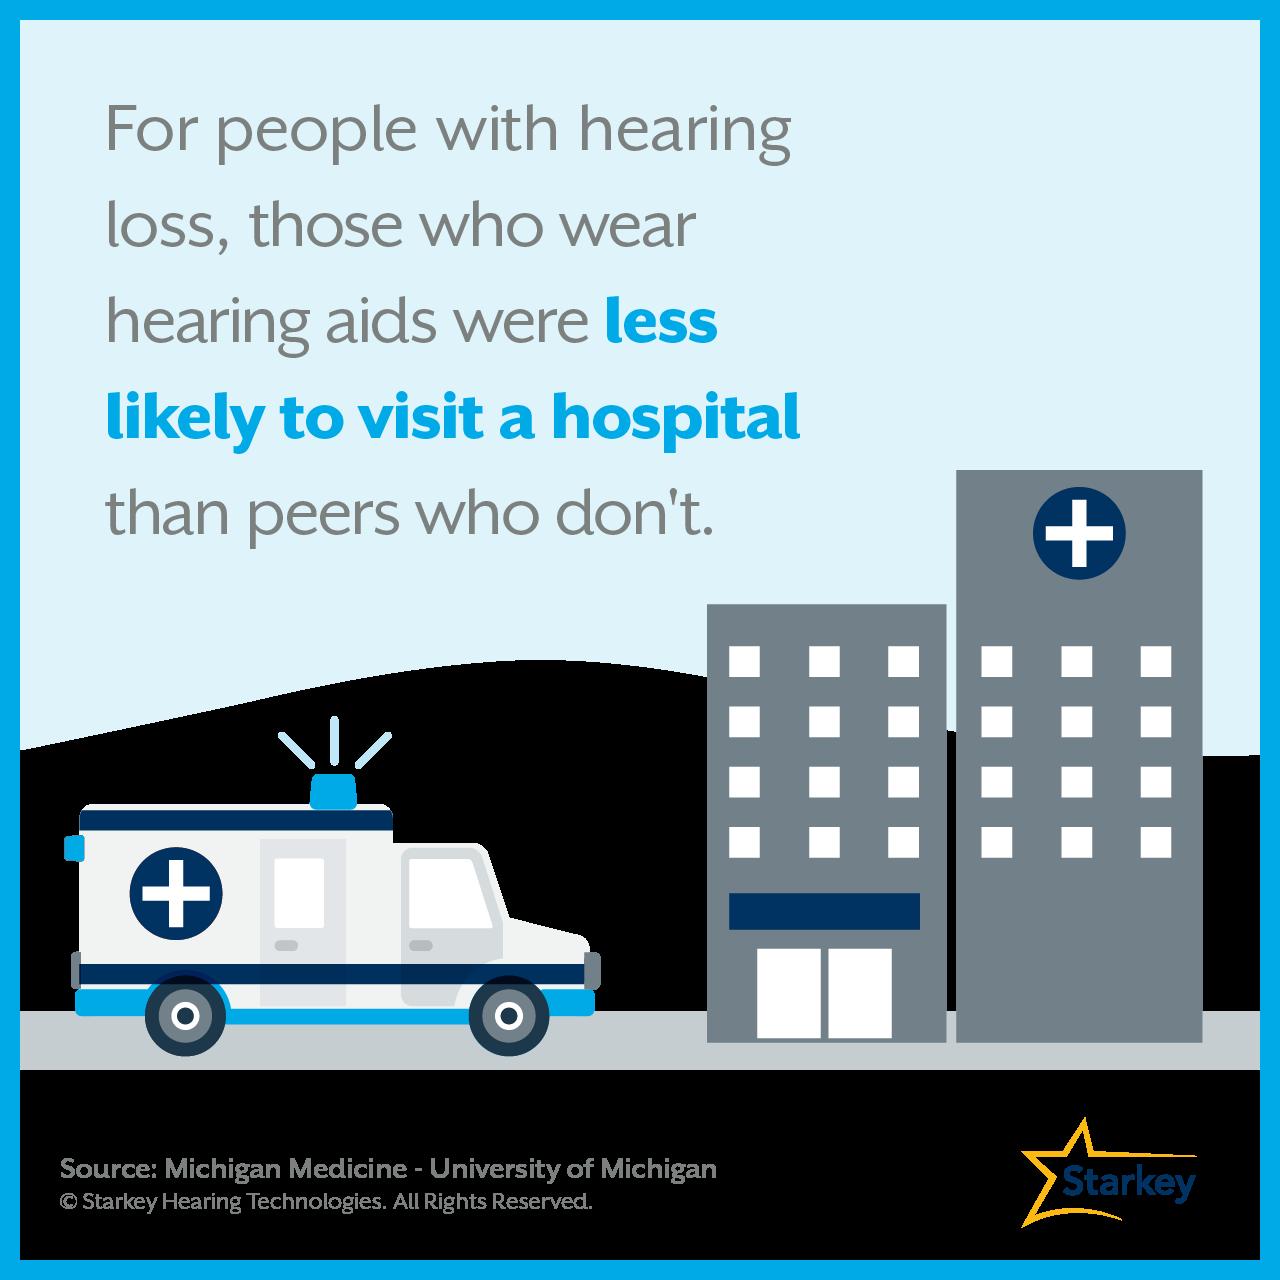 Starkey Blog On Hearing Loss And Hearing Aids